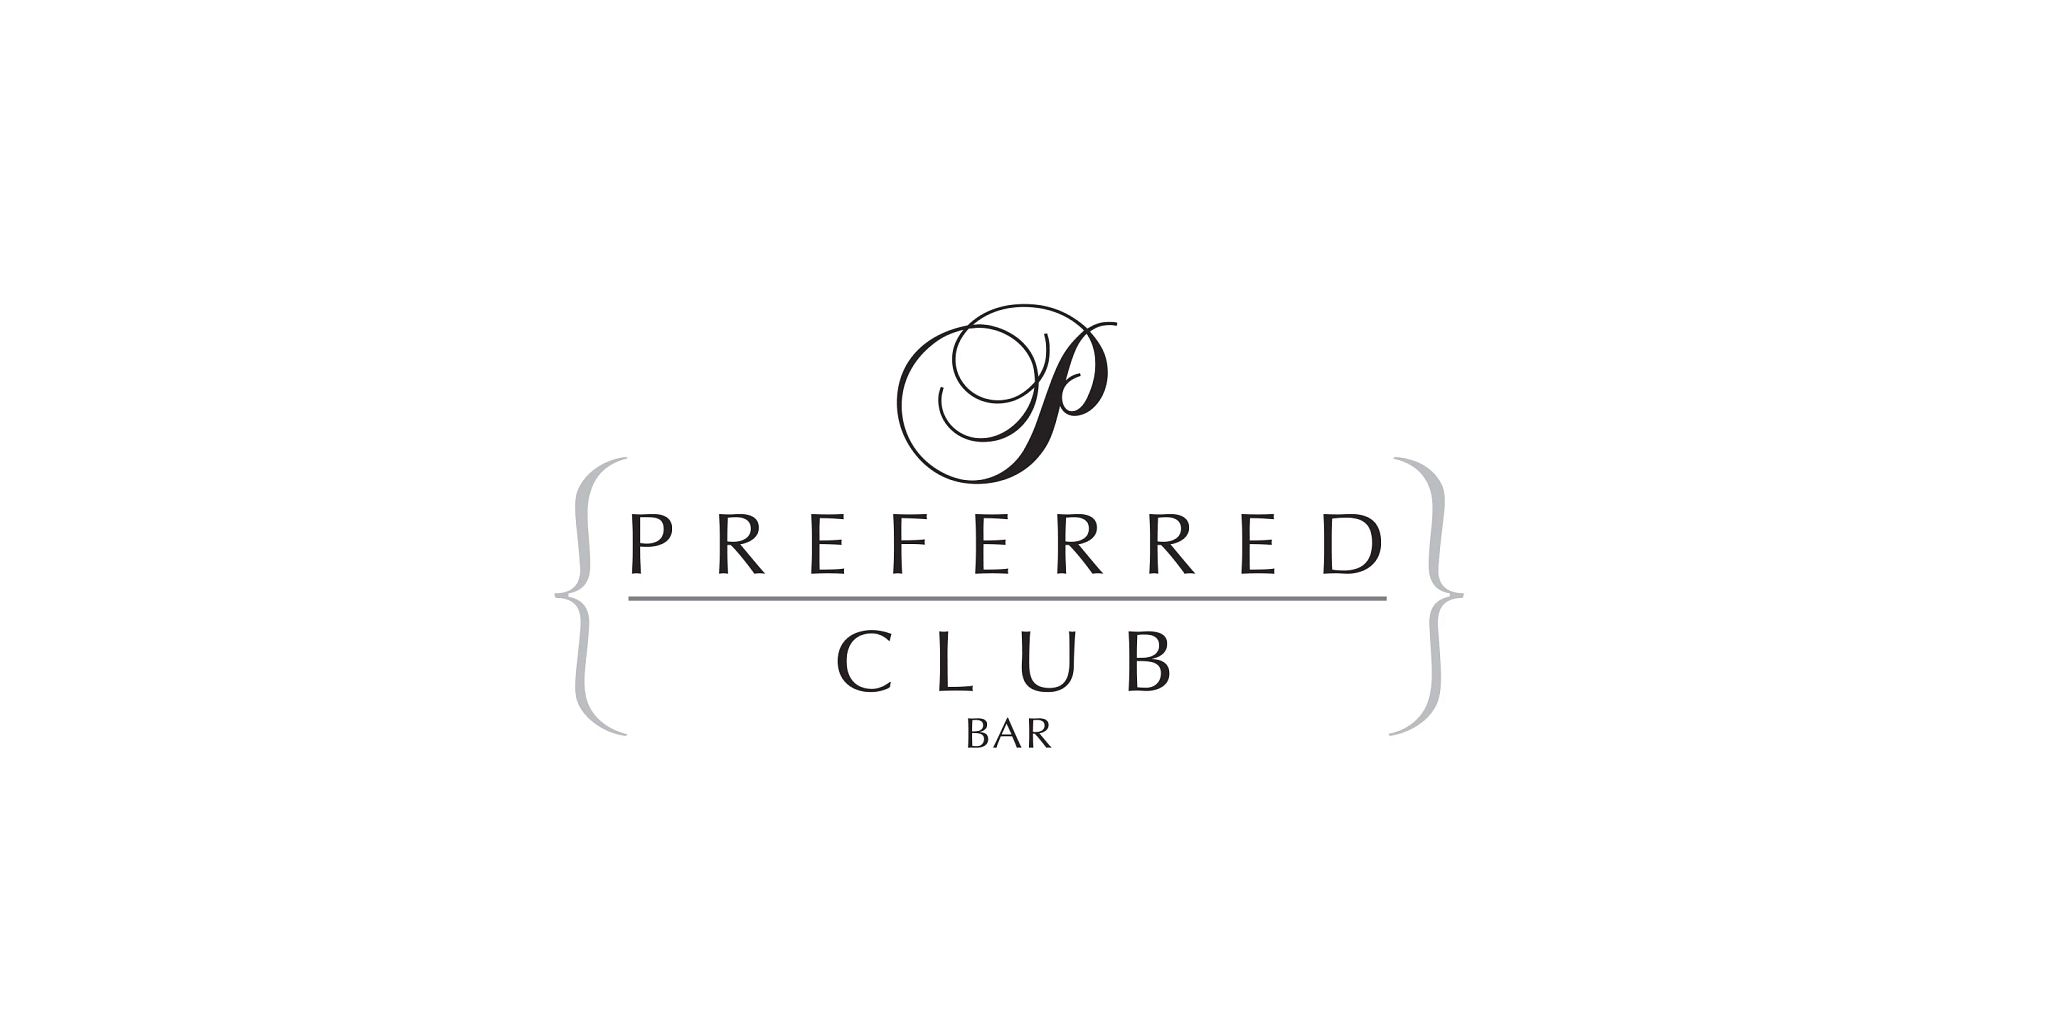 Preferred Club Bar Logo serving premium cocktails and food